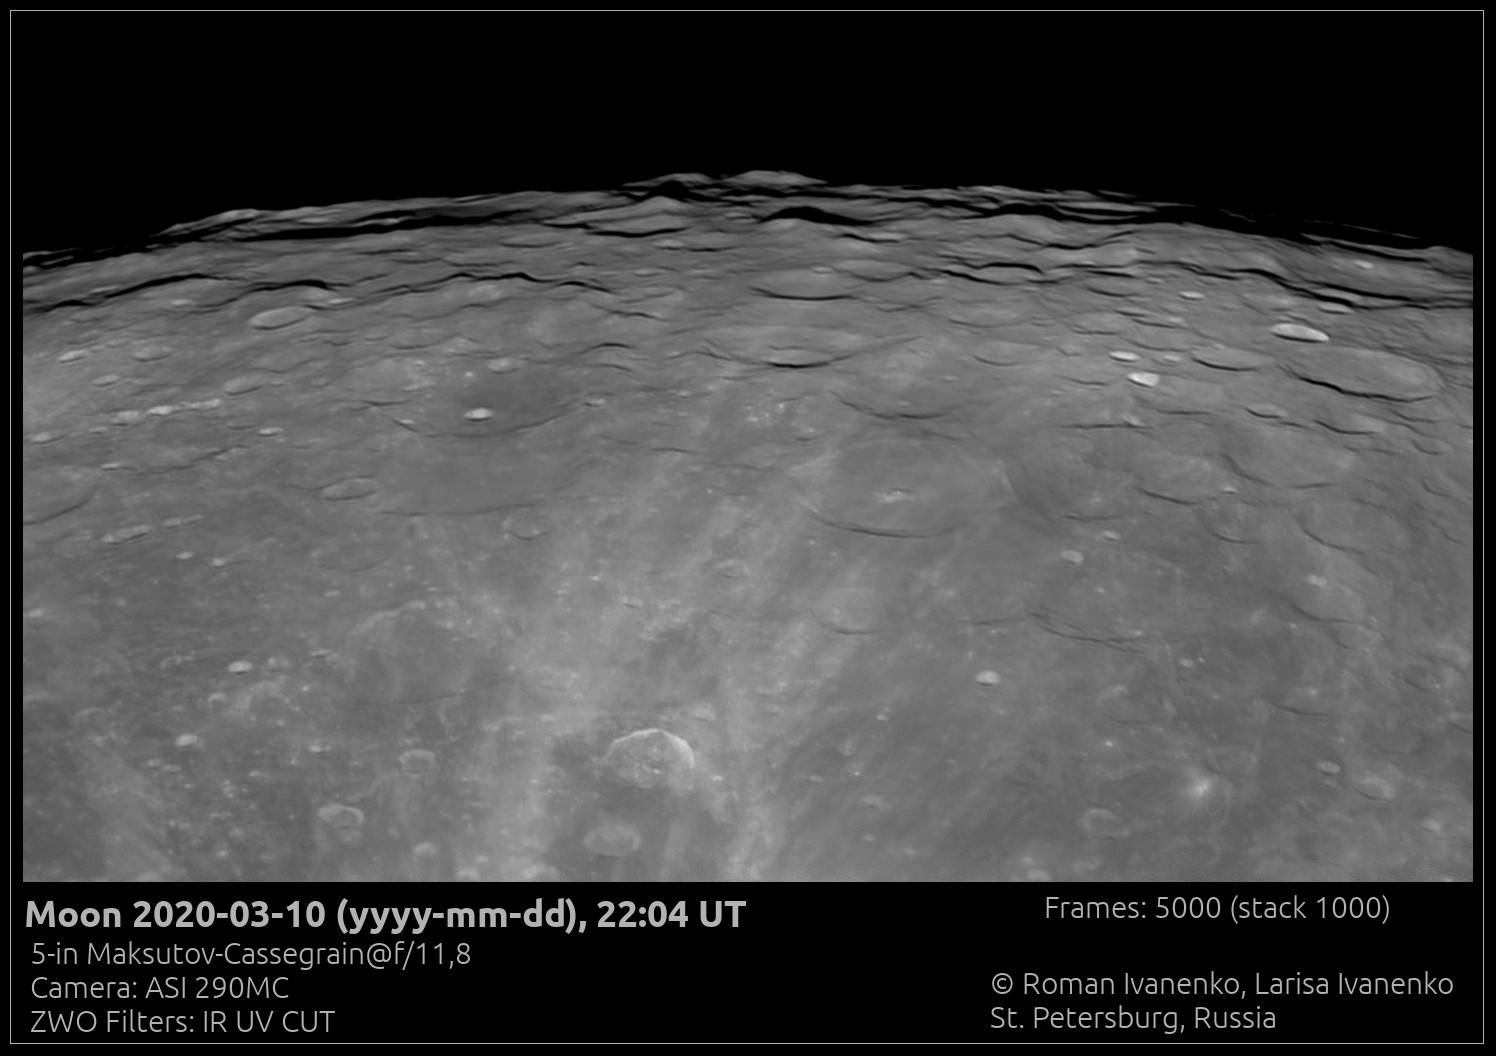 Фото Луны 10 марта 2020 года